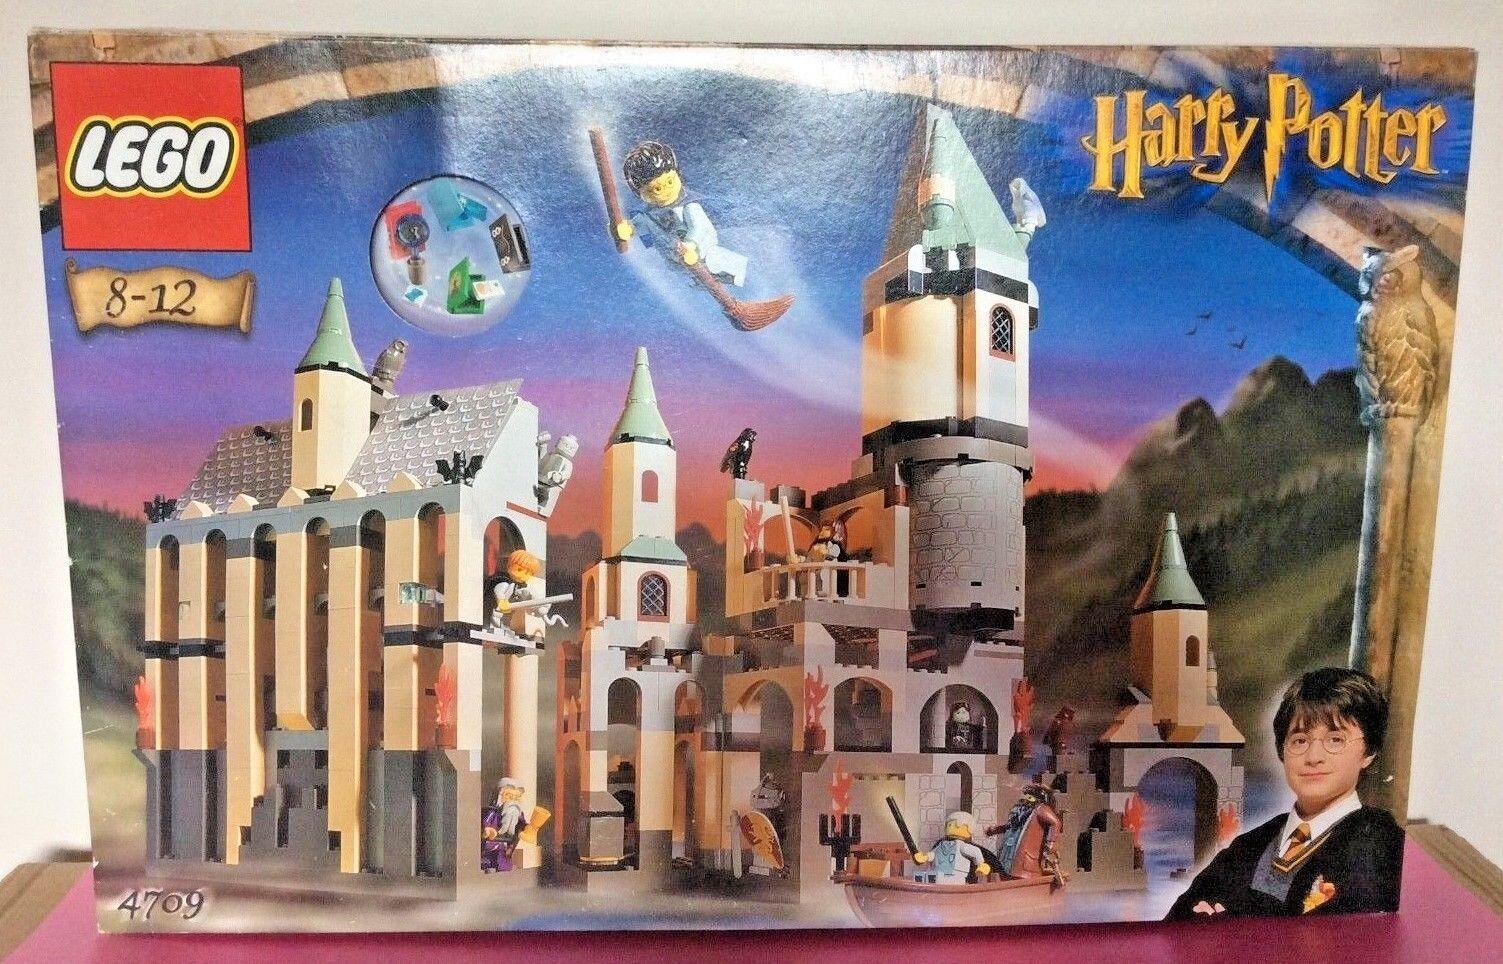 Lego Harry Potter  4709 Hogwarts Castle-BRAND NEW NEW NEW & SEALED  RARE f6c9e5